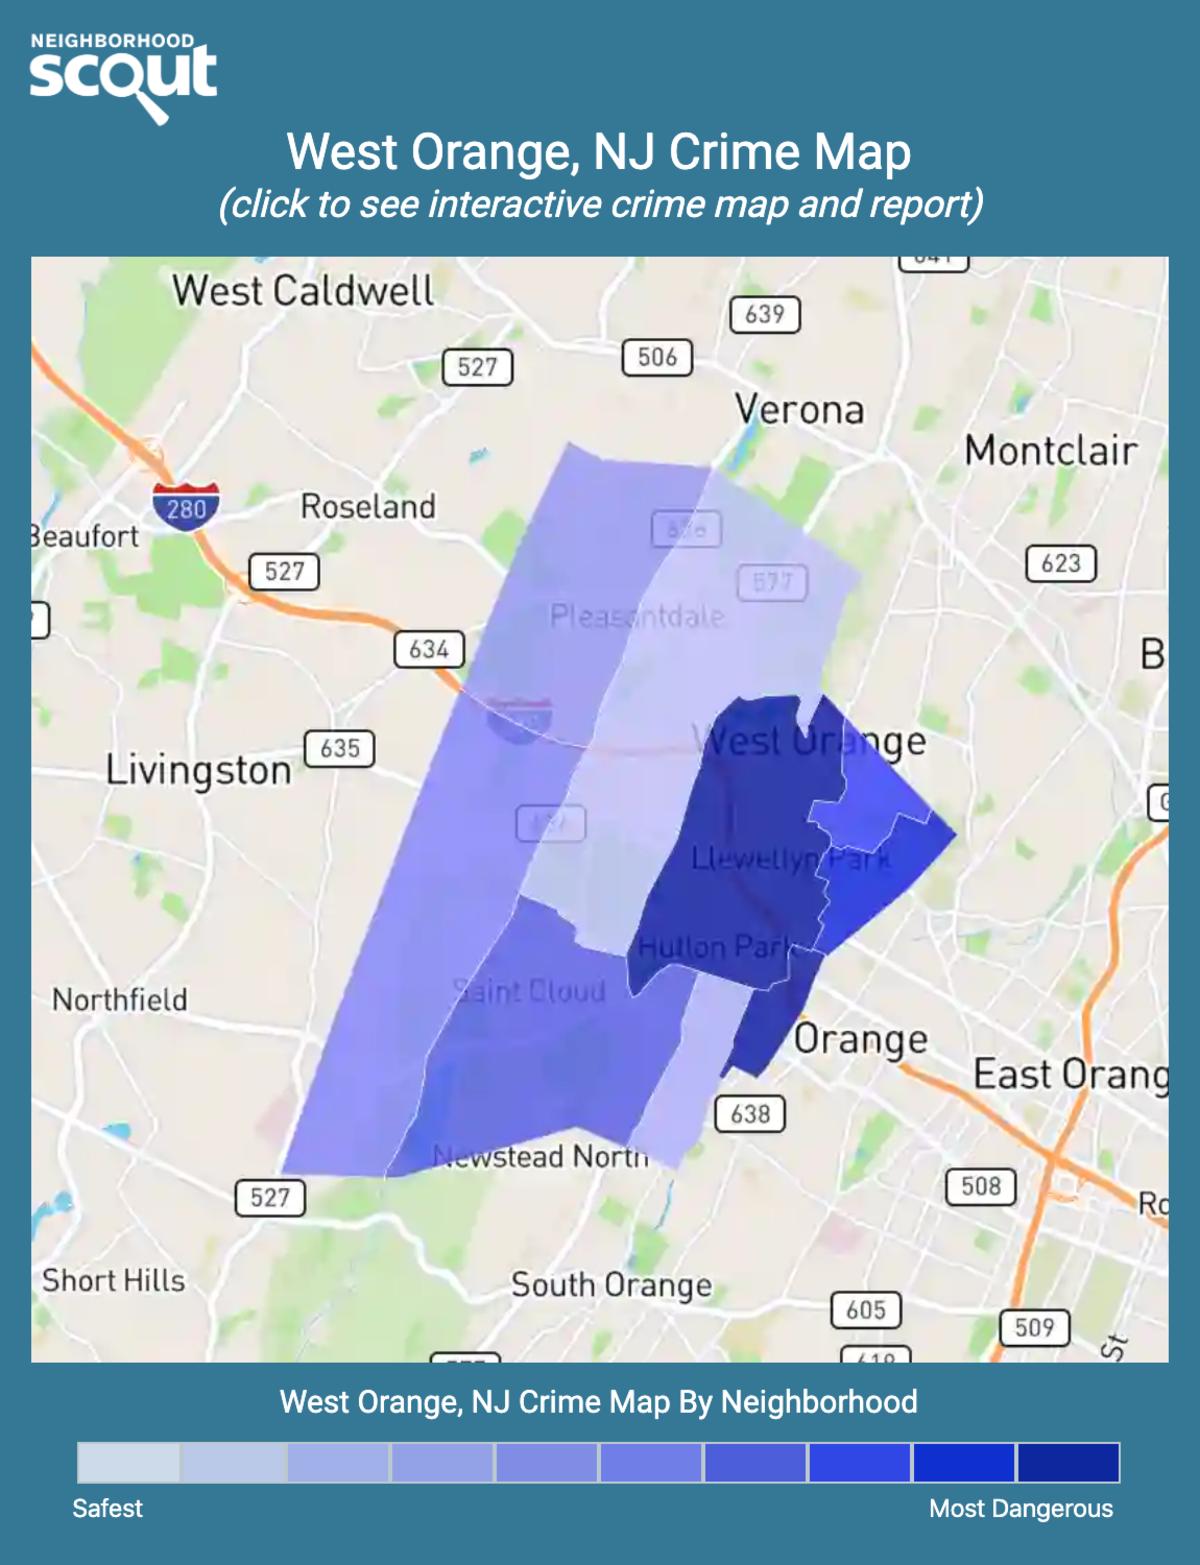 West Orange, New Jersey crime map